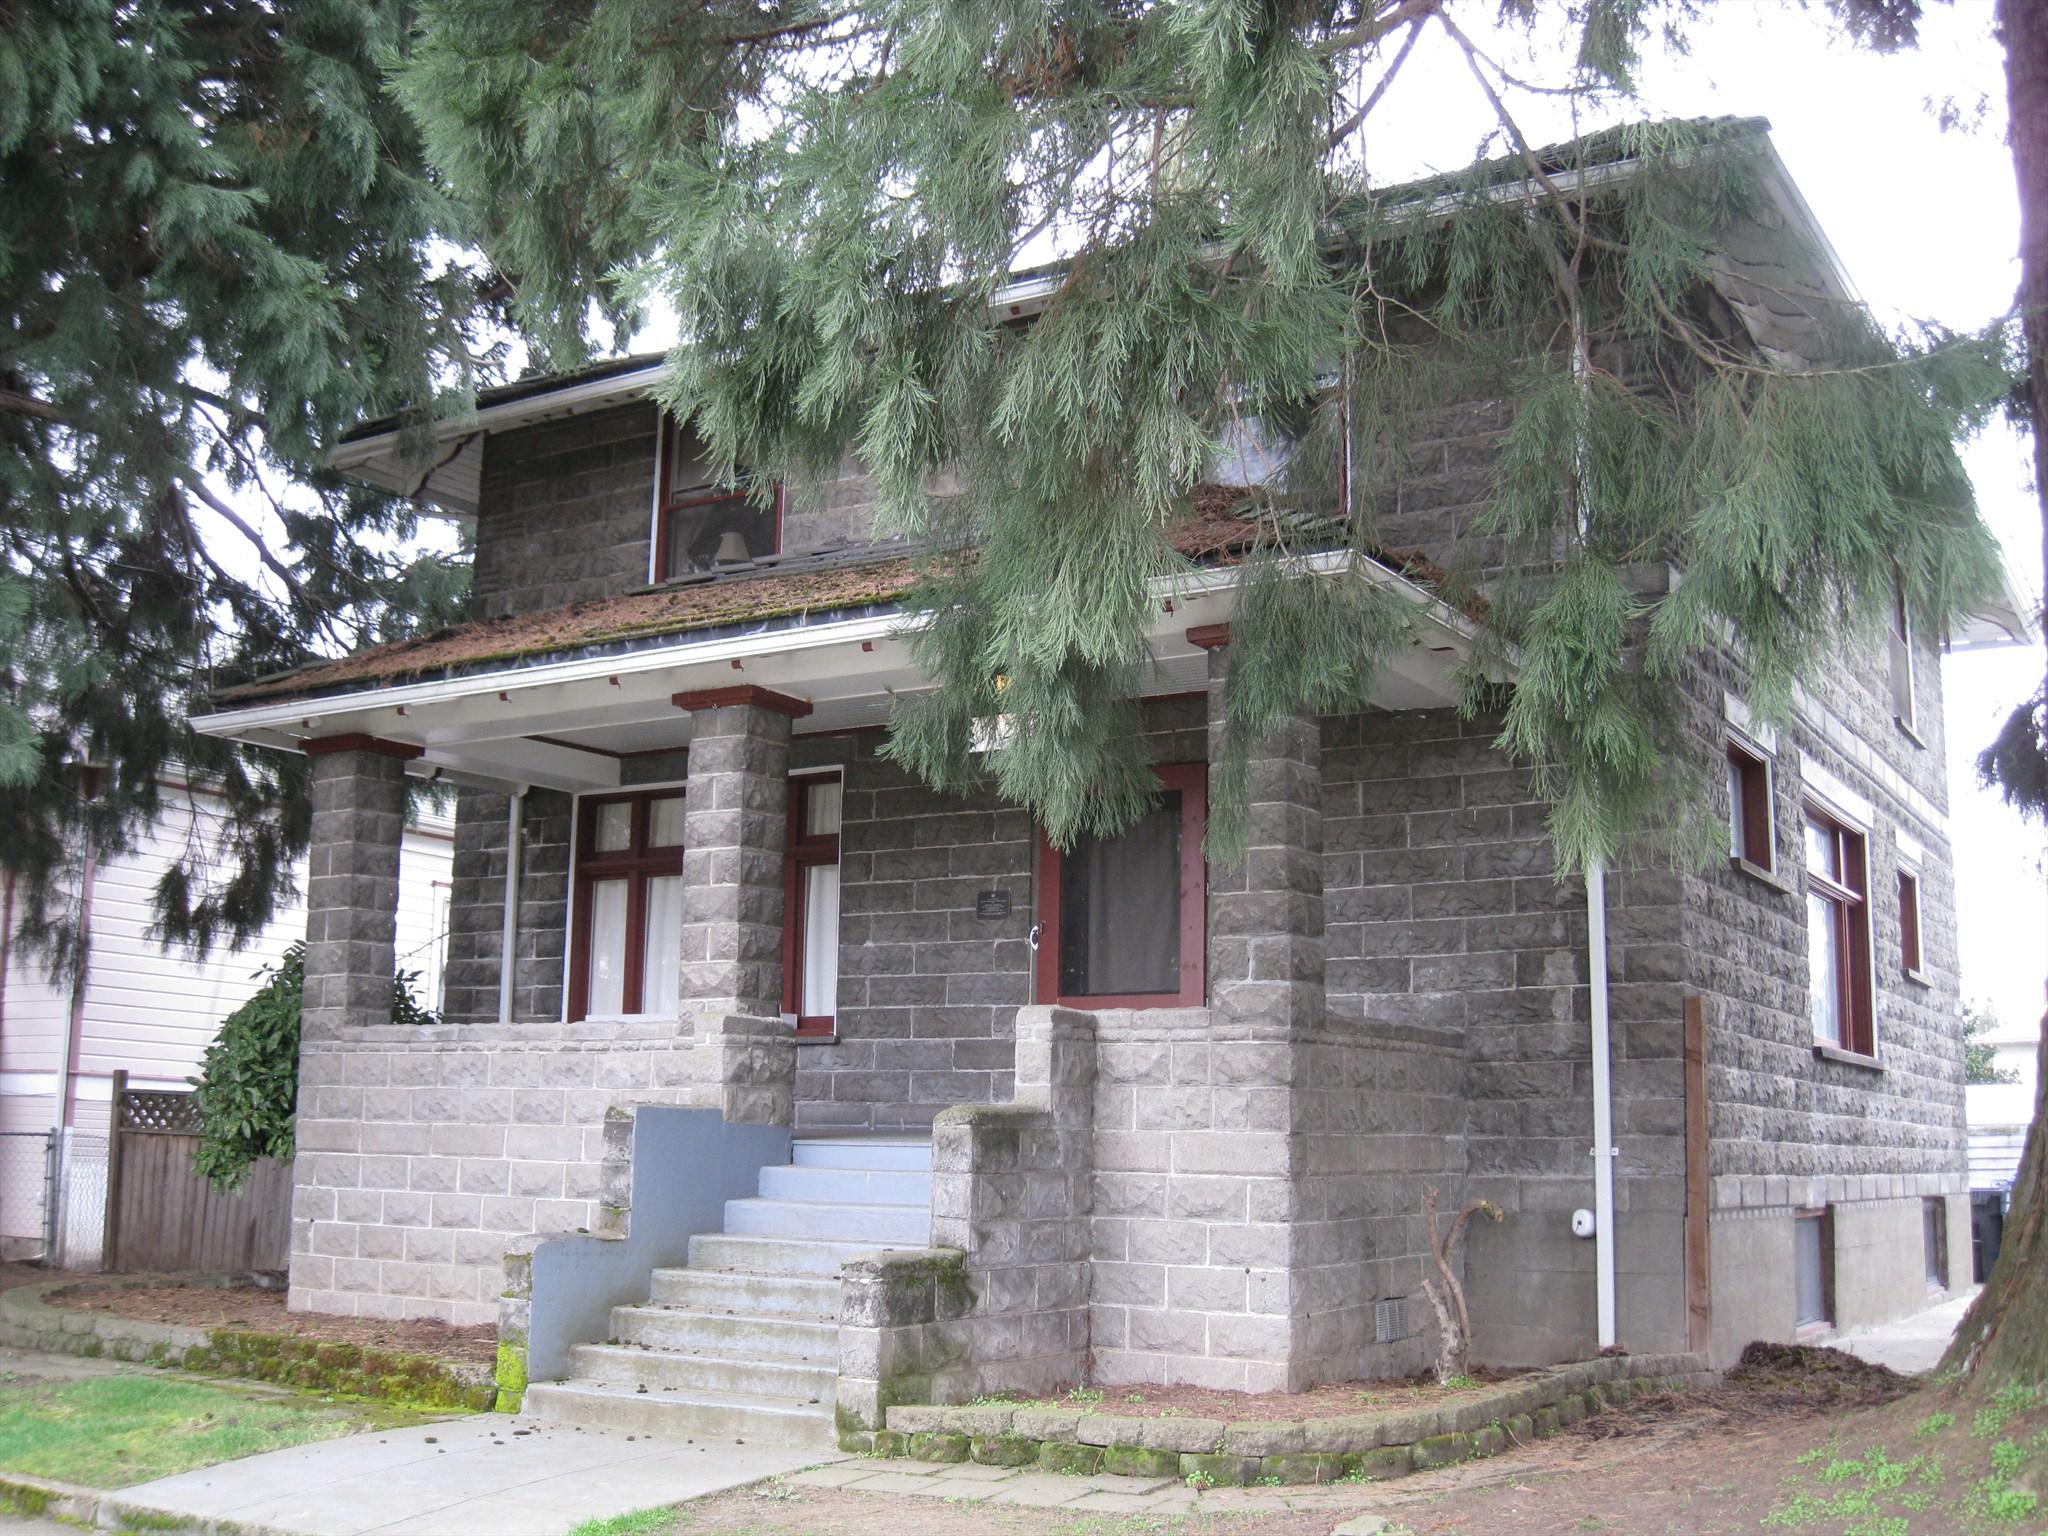 Ornamental Concrete Block House  Court StreetChemeketa Street Historic District  Salem